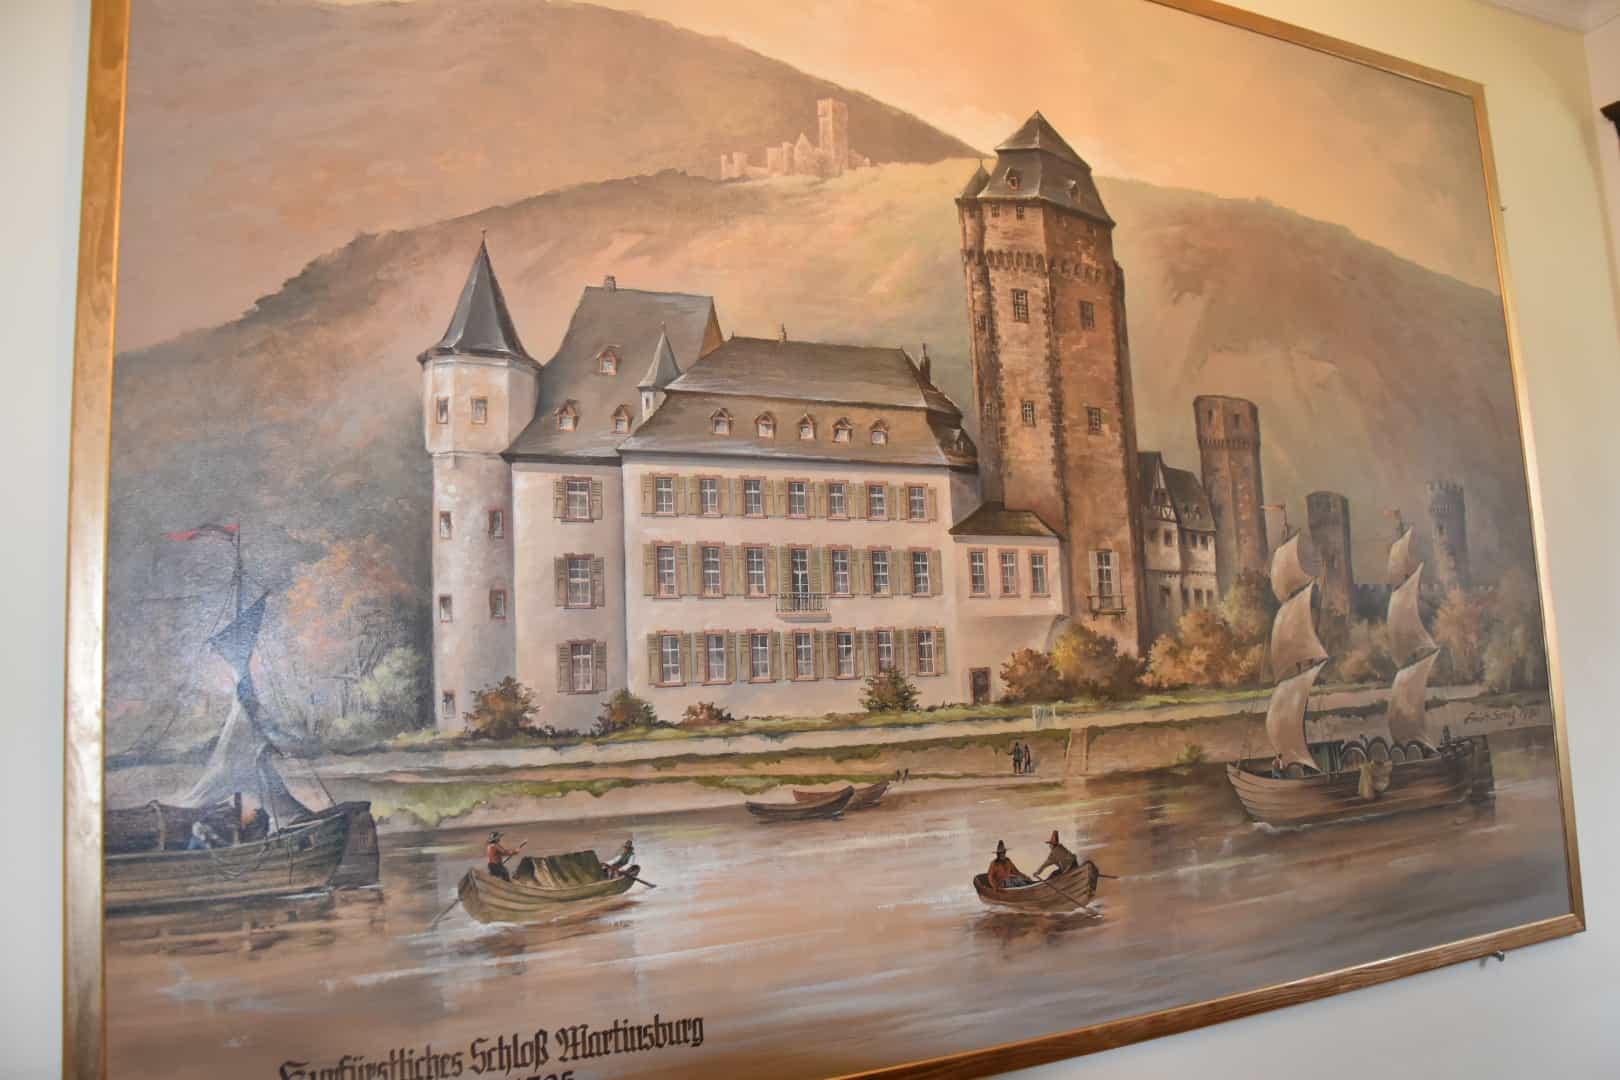 Unser Clubausflug Mai 19 – Marksburg – Rüdiger im Martinsschloss – Whisky = GESAMTKUNSTWERK !!!